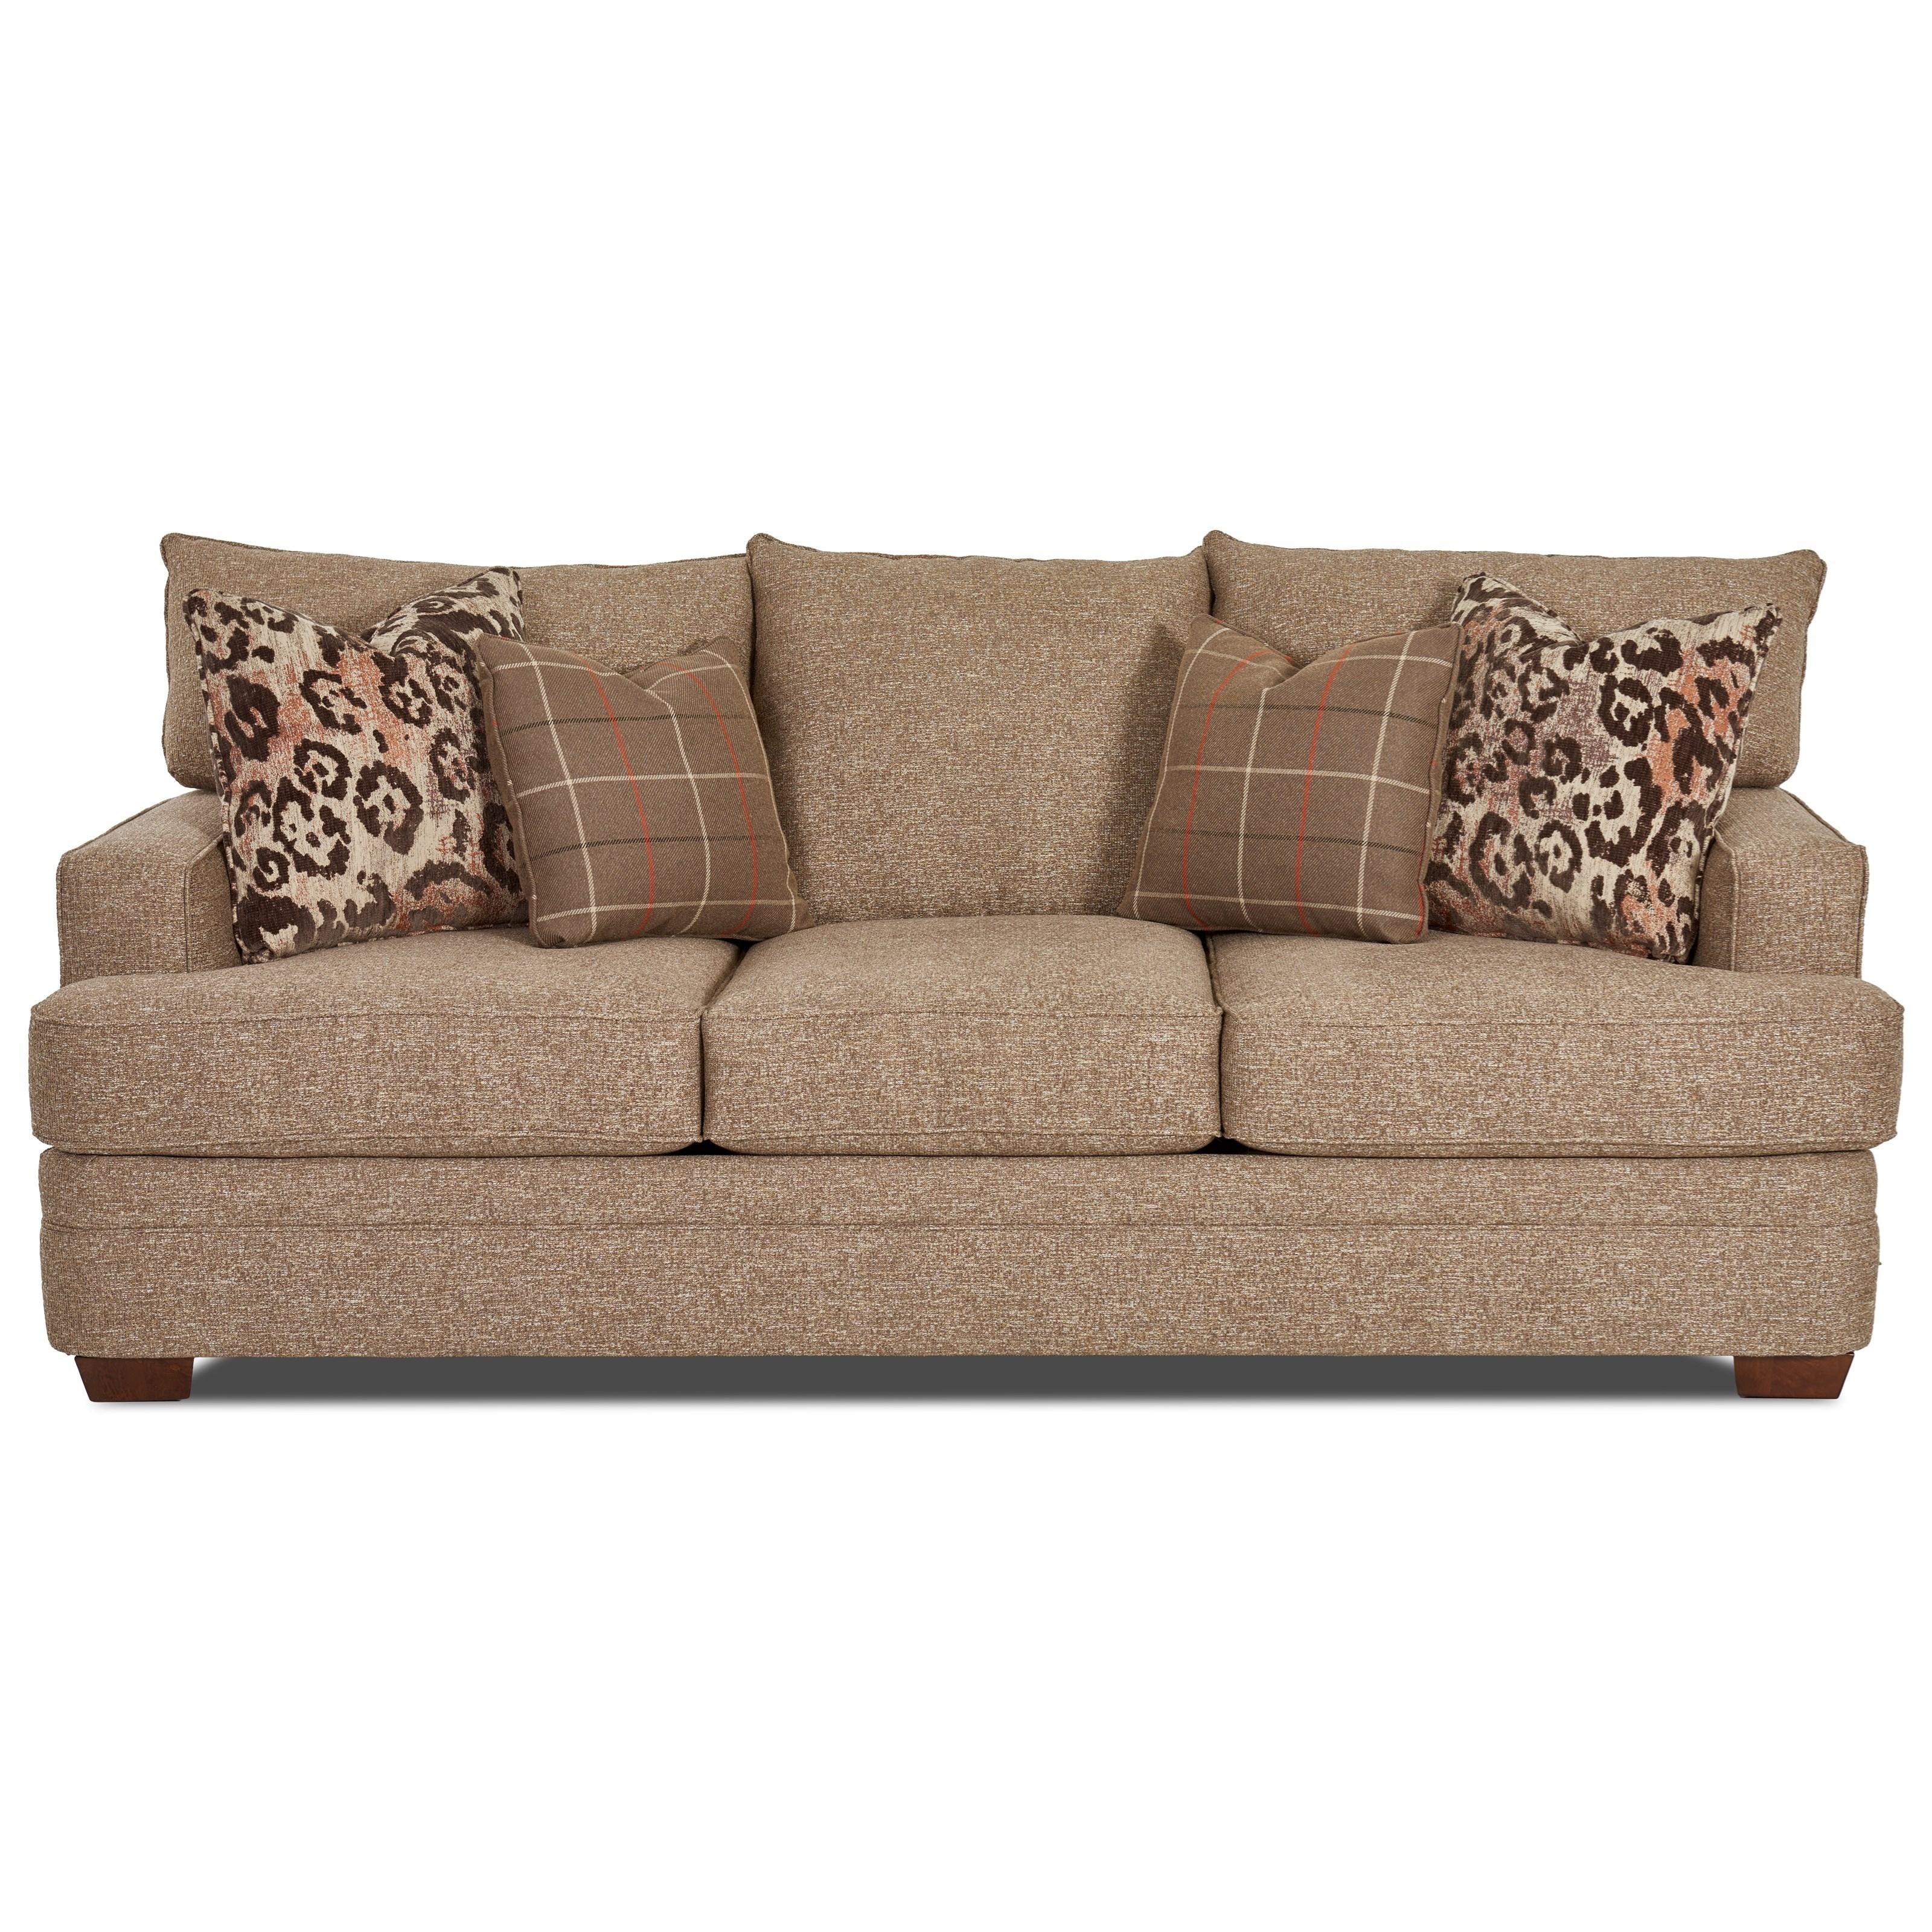 Klaussner Chadwick Chadwick Sofa - Item Number: K28500 S